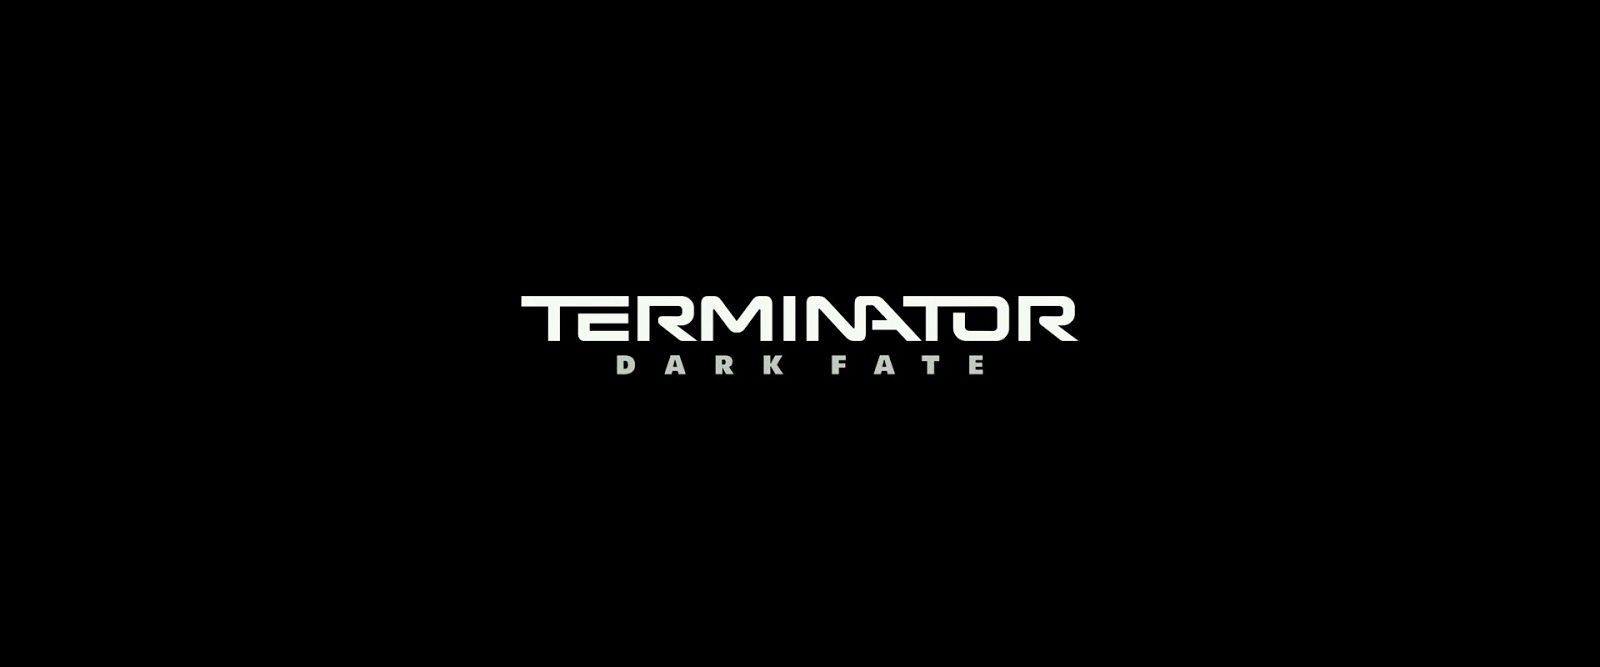 Terminator+Destino+oculto+%282019%29+HD+1080p+WEB-DL+AMZN+Latino+-+Ingles+-+Descargatepelis.com.mkv_snapshot_00.04.18_%5B2020.01.14_02.44.59%5D.jpg (1600×667)